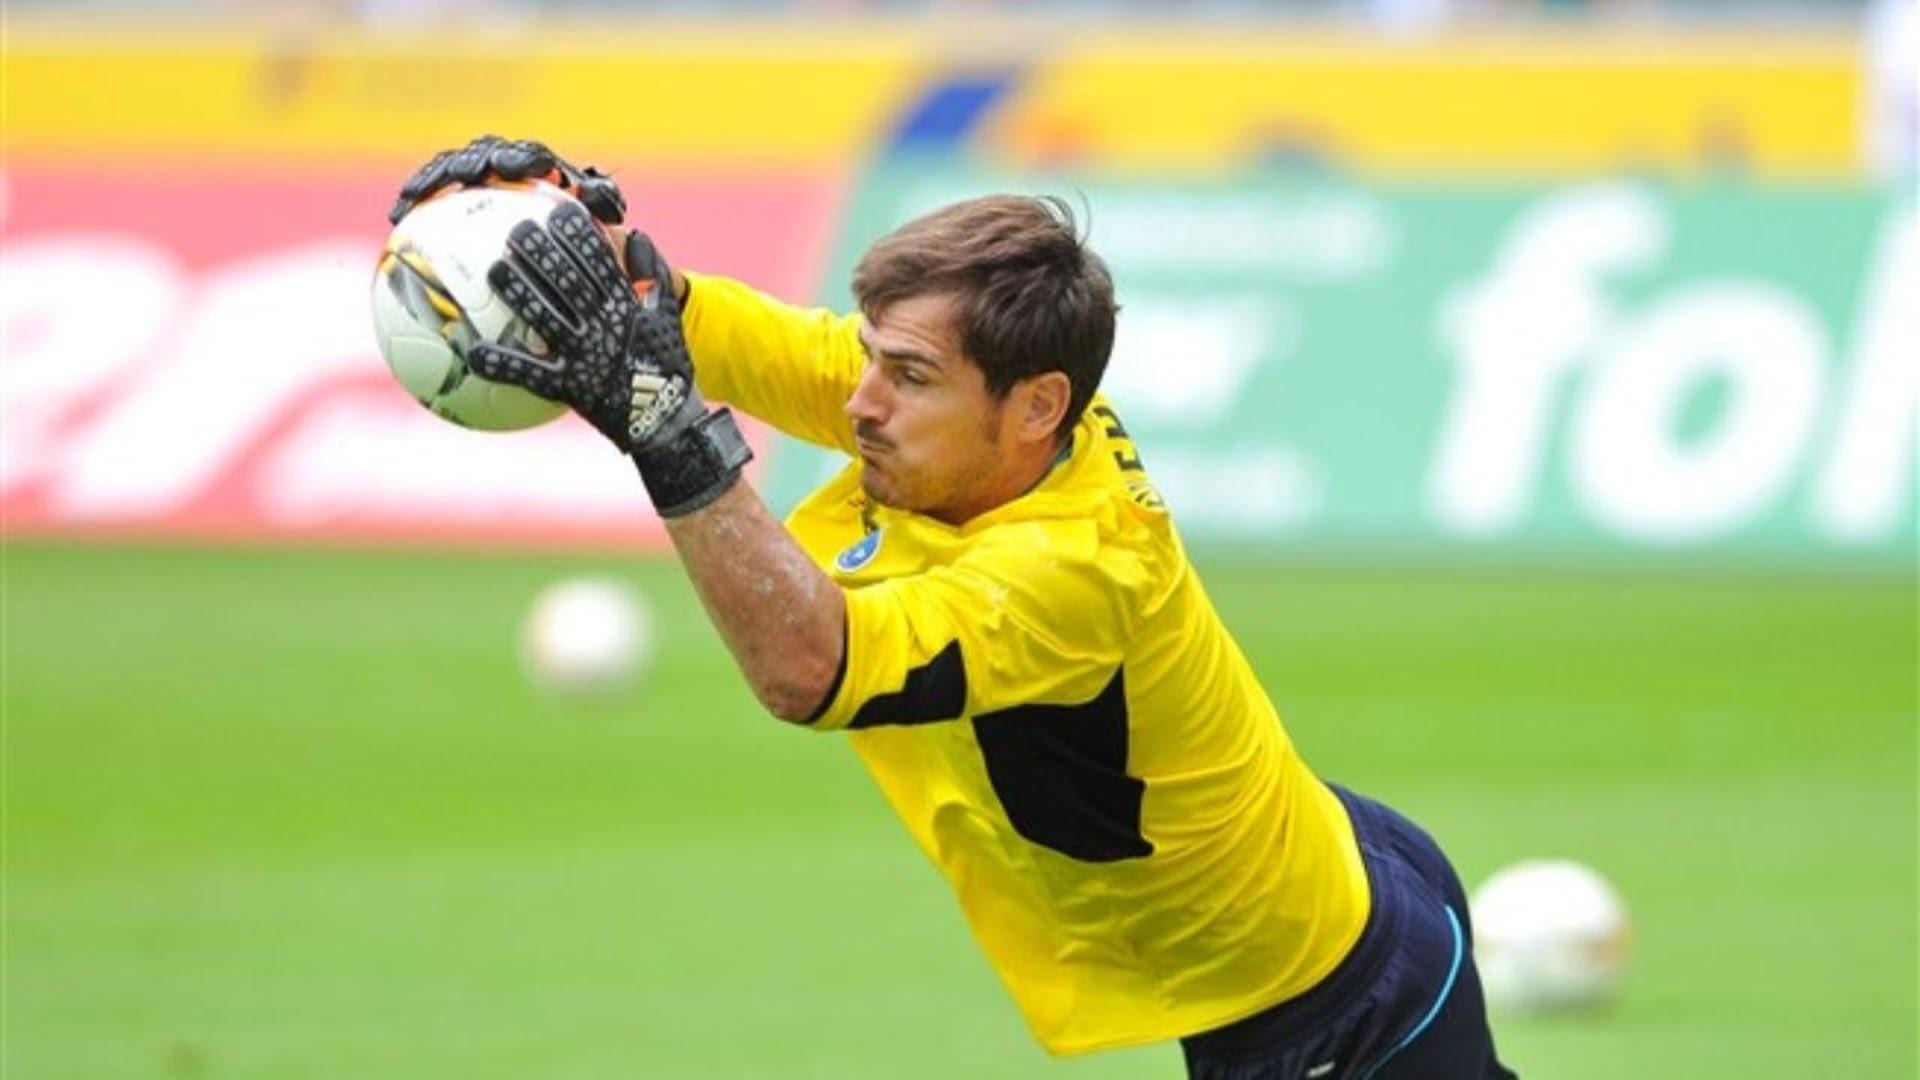 3000x2000 Iker Casillas Images